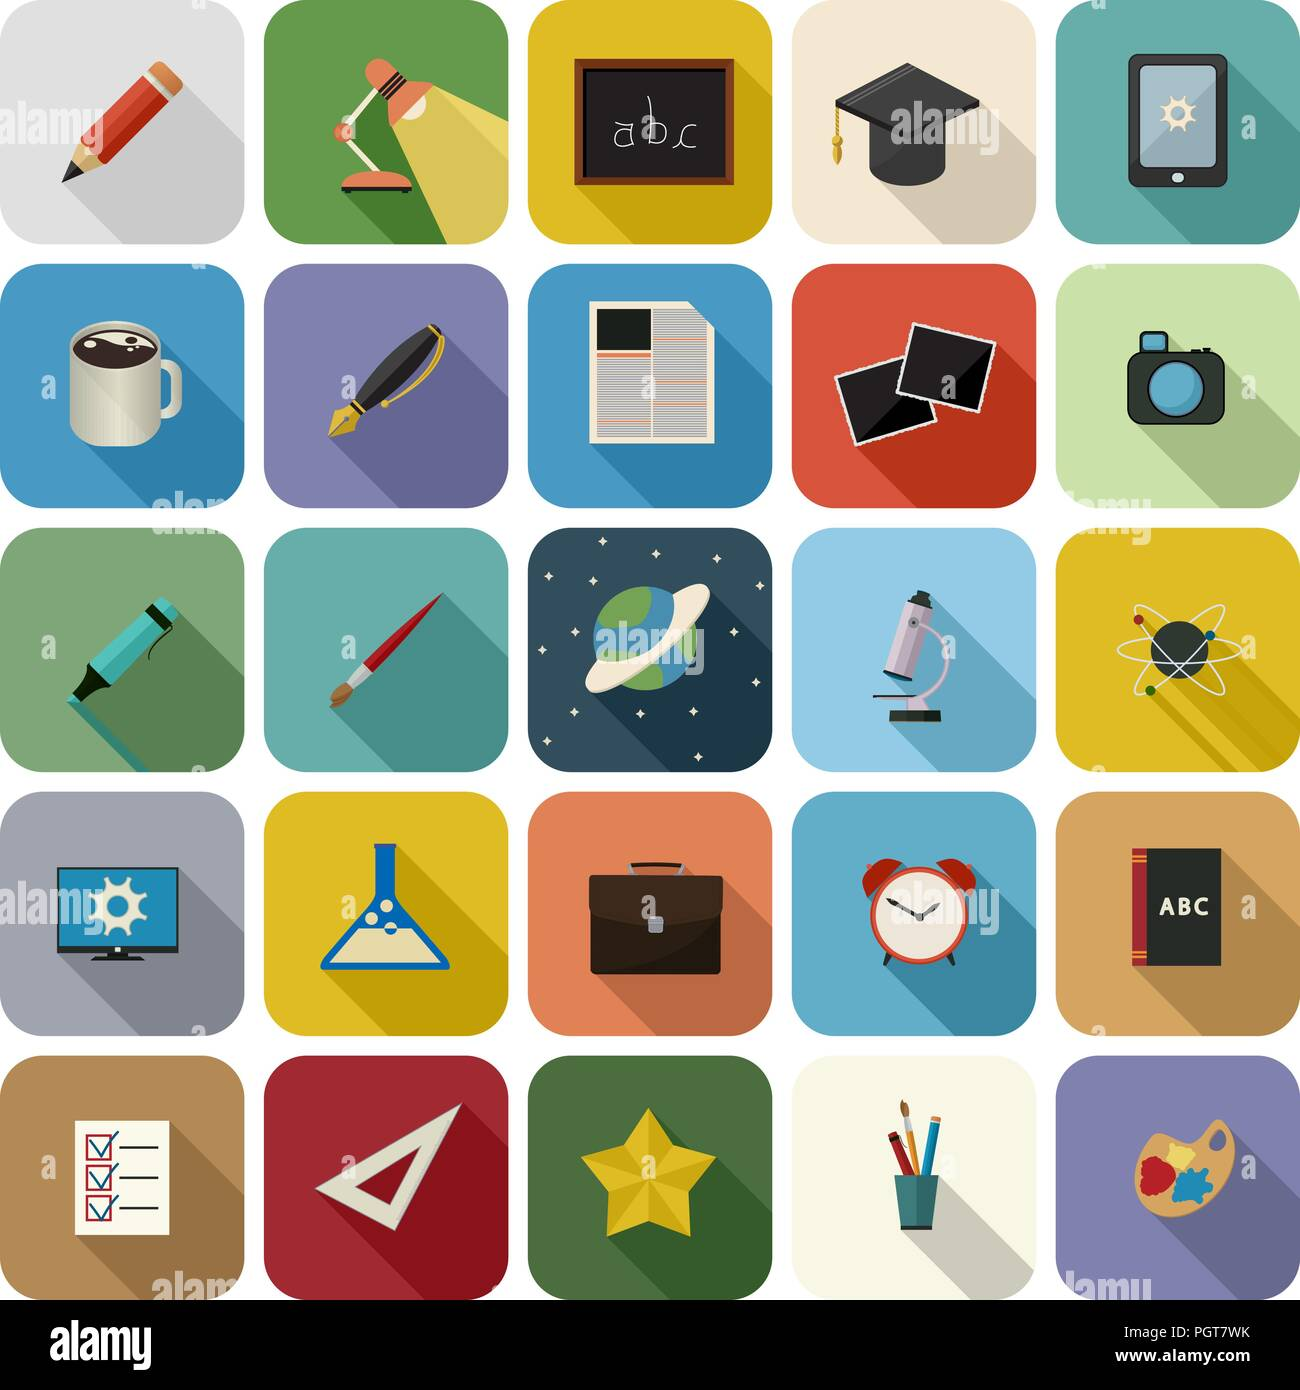 Set of education flat icon set with long shaddow against white background - Stock Image